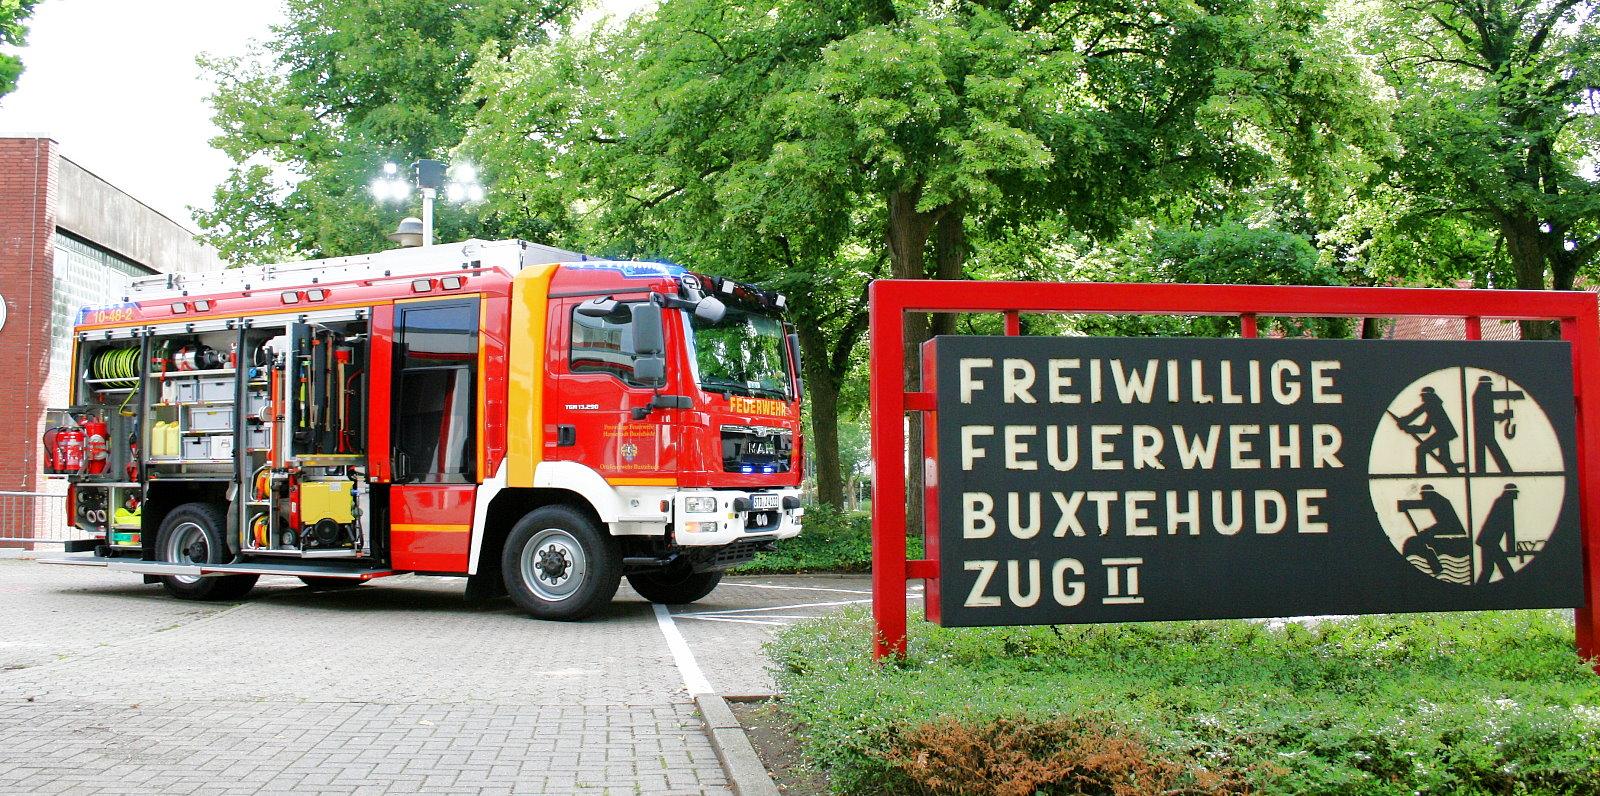 http://feuerwehr-buxtehude.de/media/img/bilder_ow_bu2/bilder_bu2_fa/hlf/006.JPG